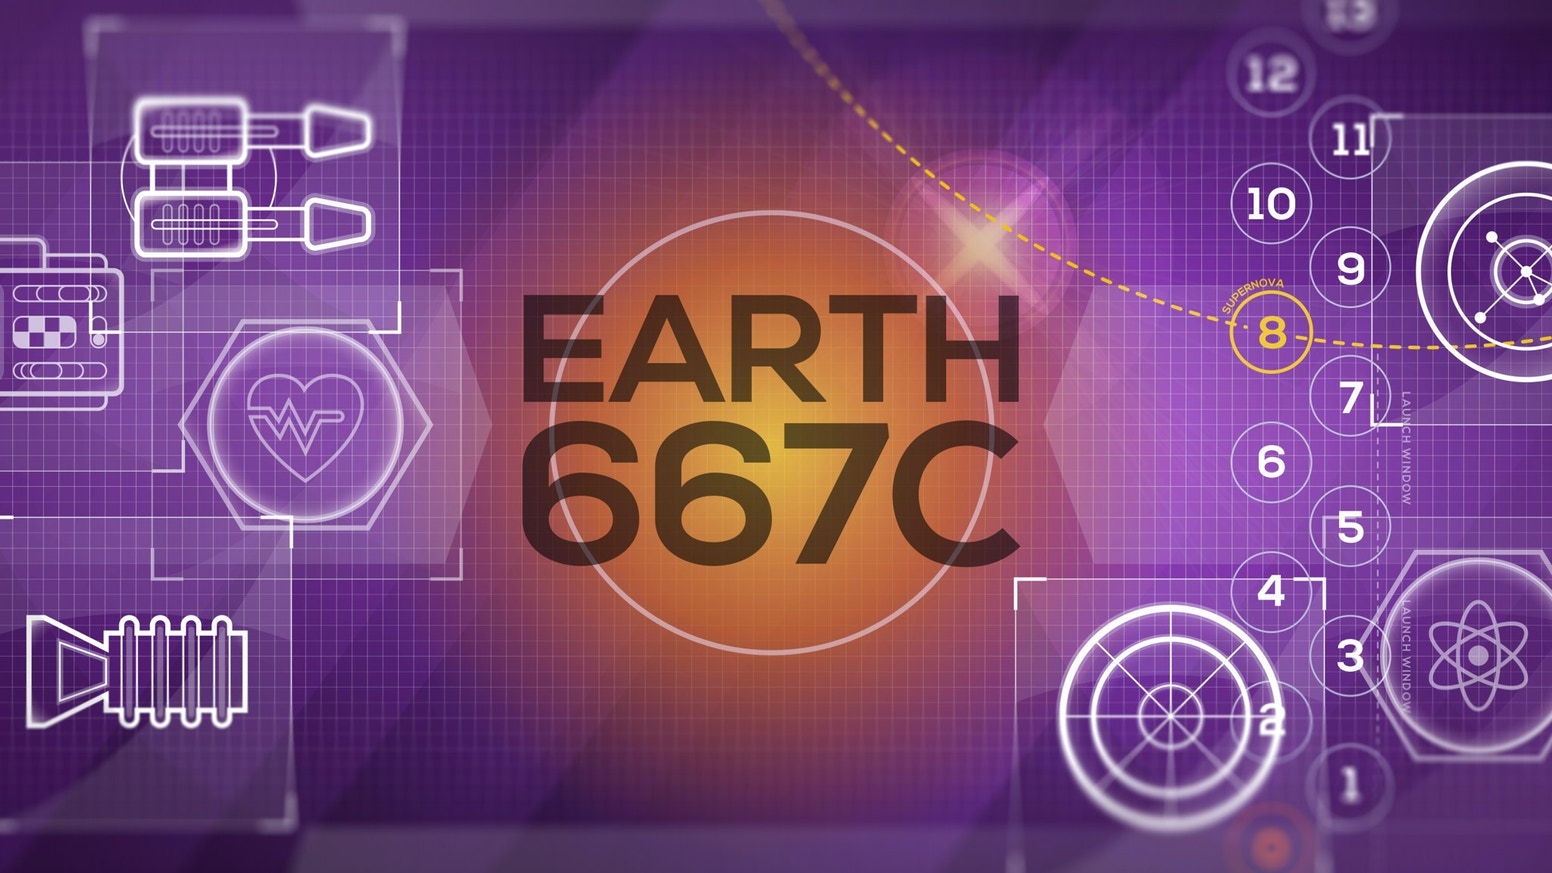 Earth C Spaceship Building Board Game By Sagan Medvec Kickstarter - Spaceship design game